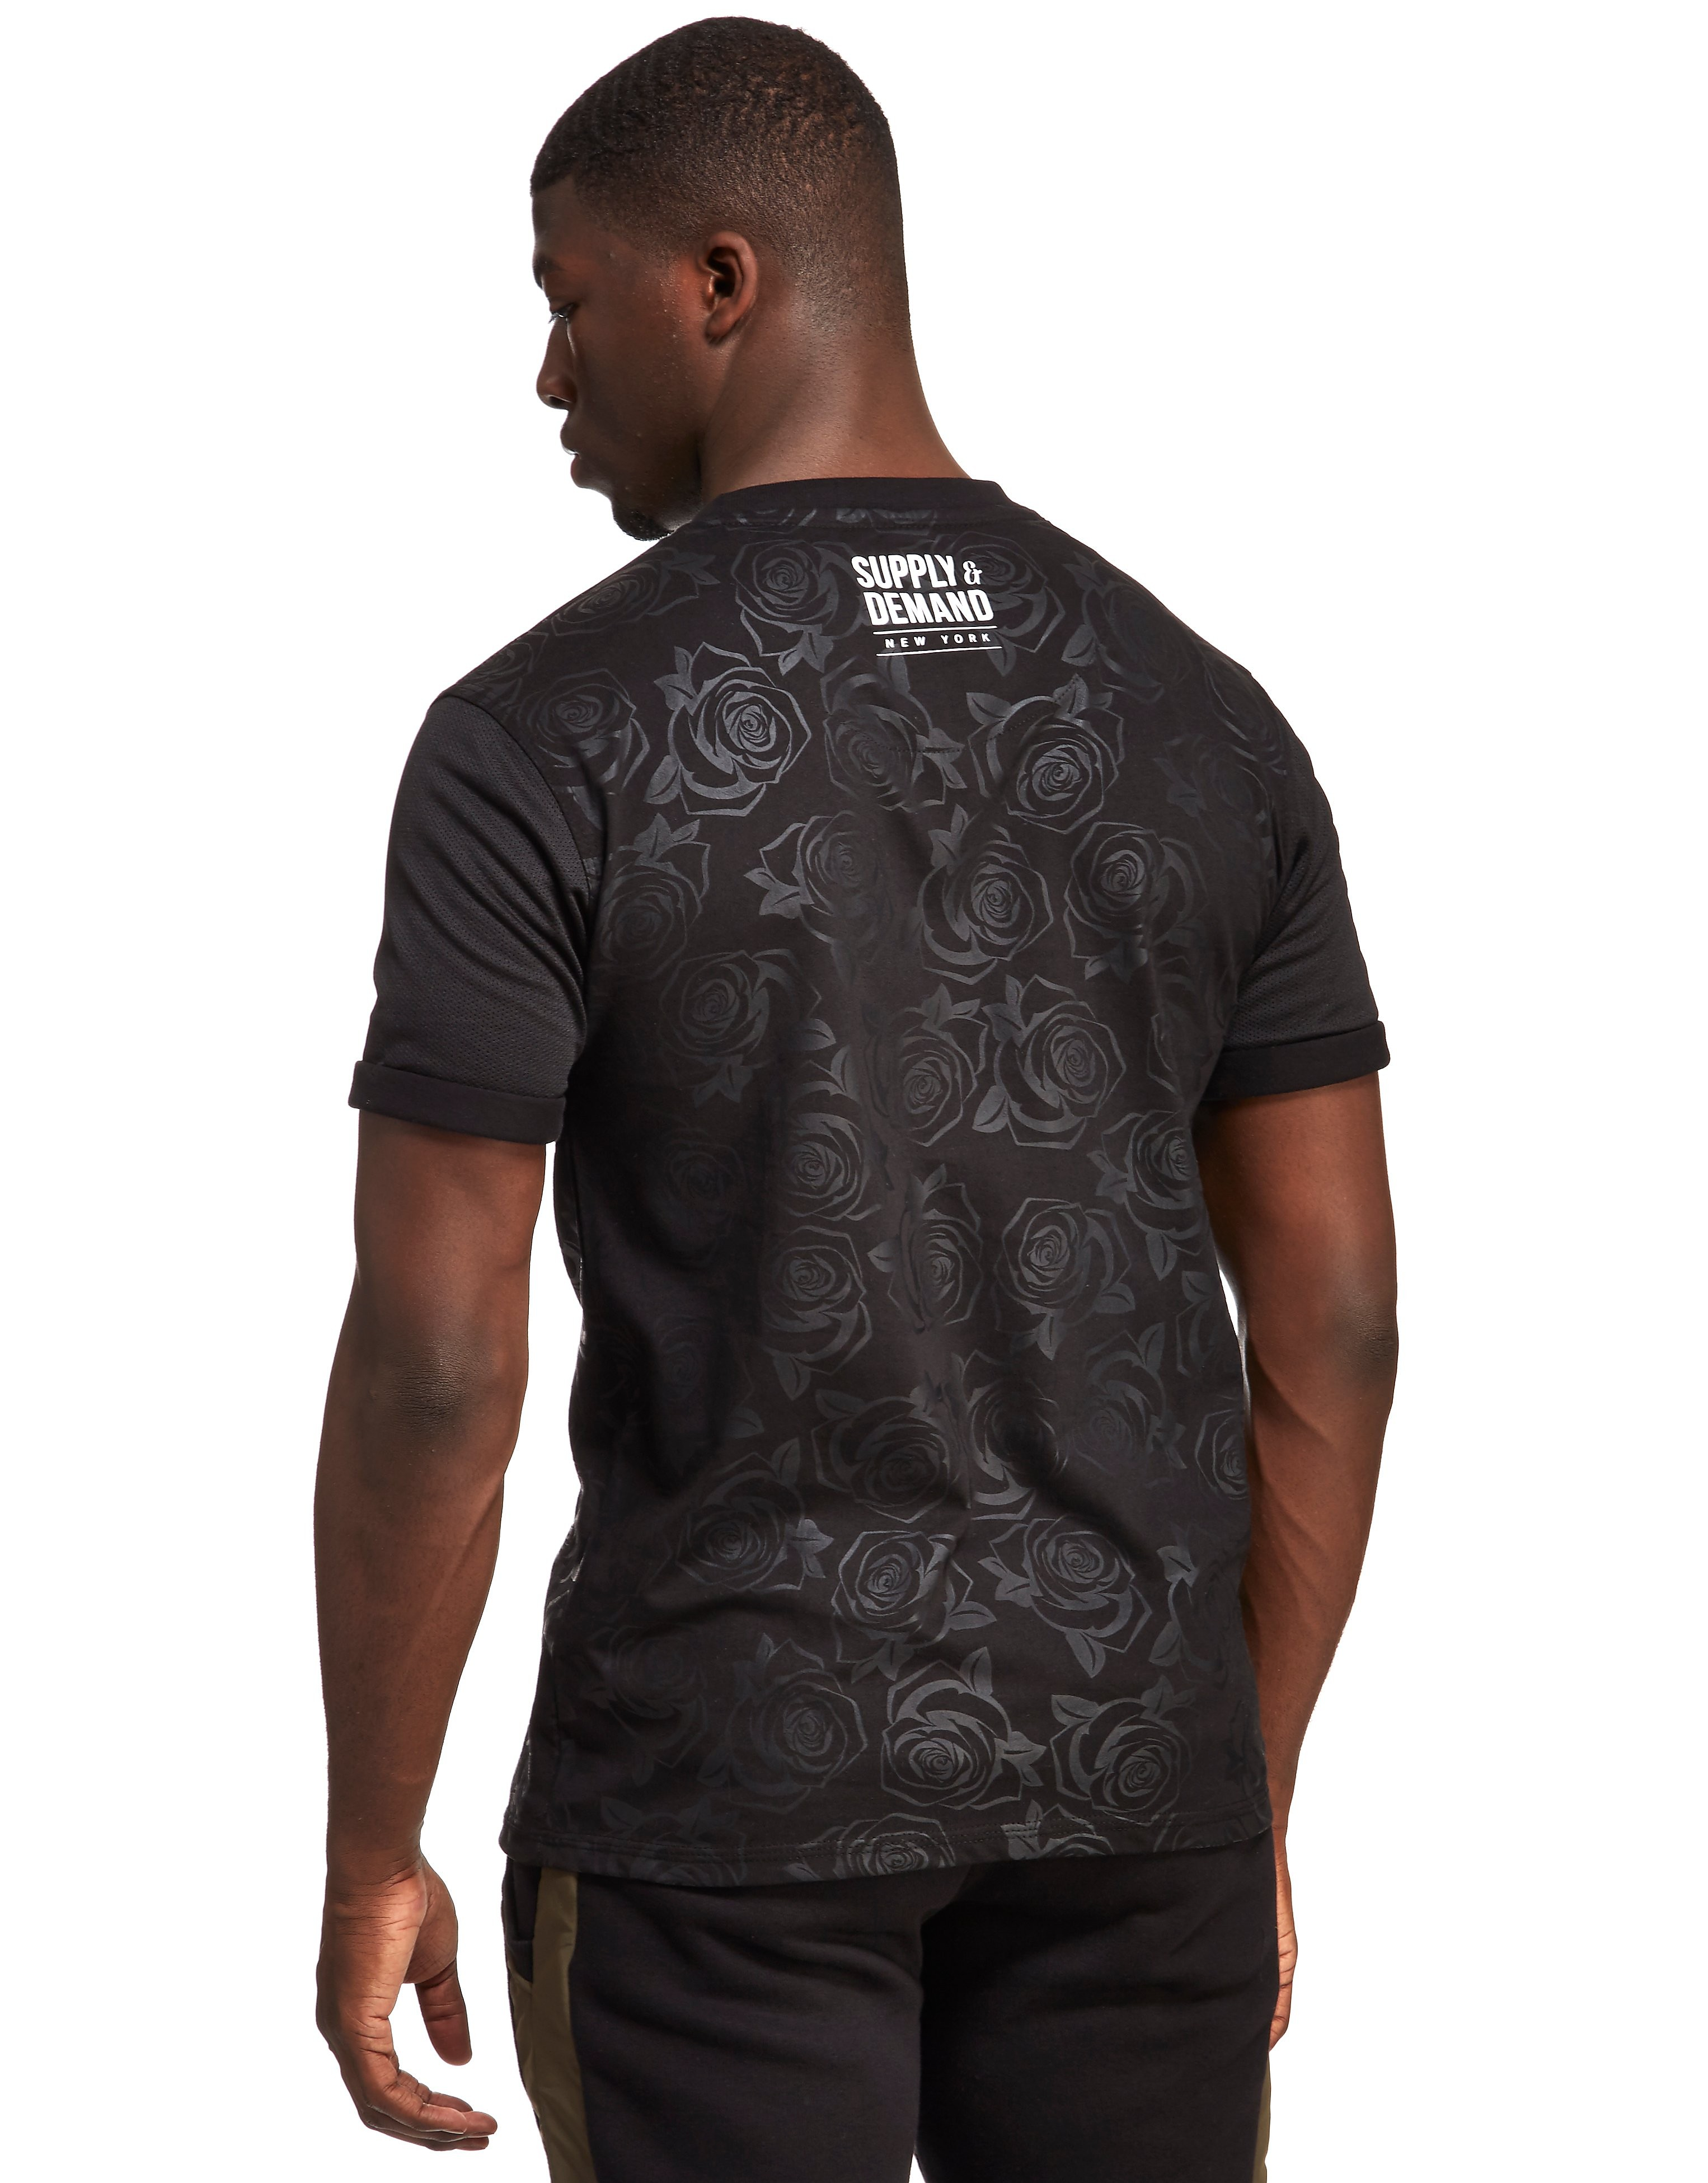 Supply & Demand Crux T-Shirt